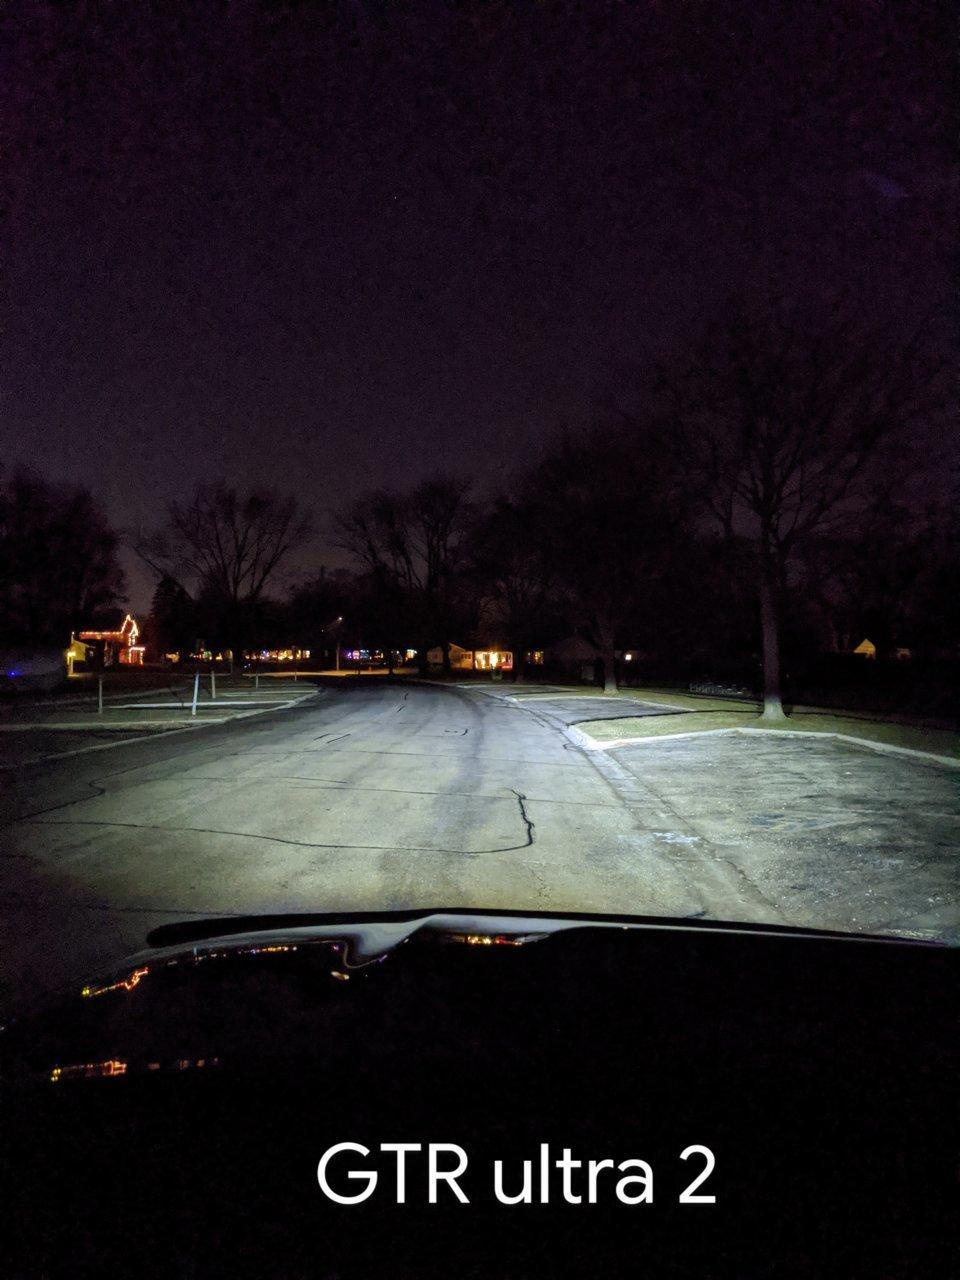 Gtr Lighting Ultra 2 0 H11 Reviews